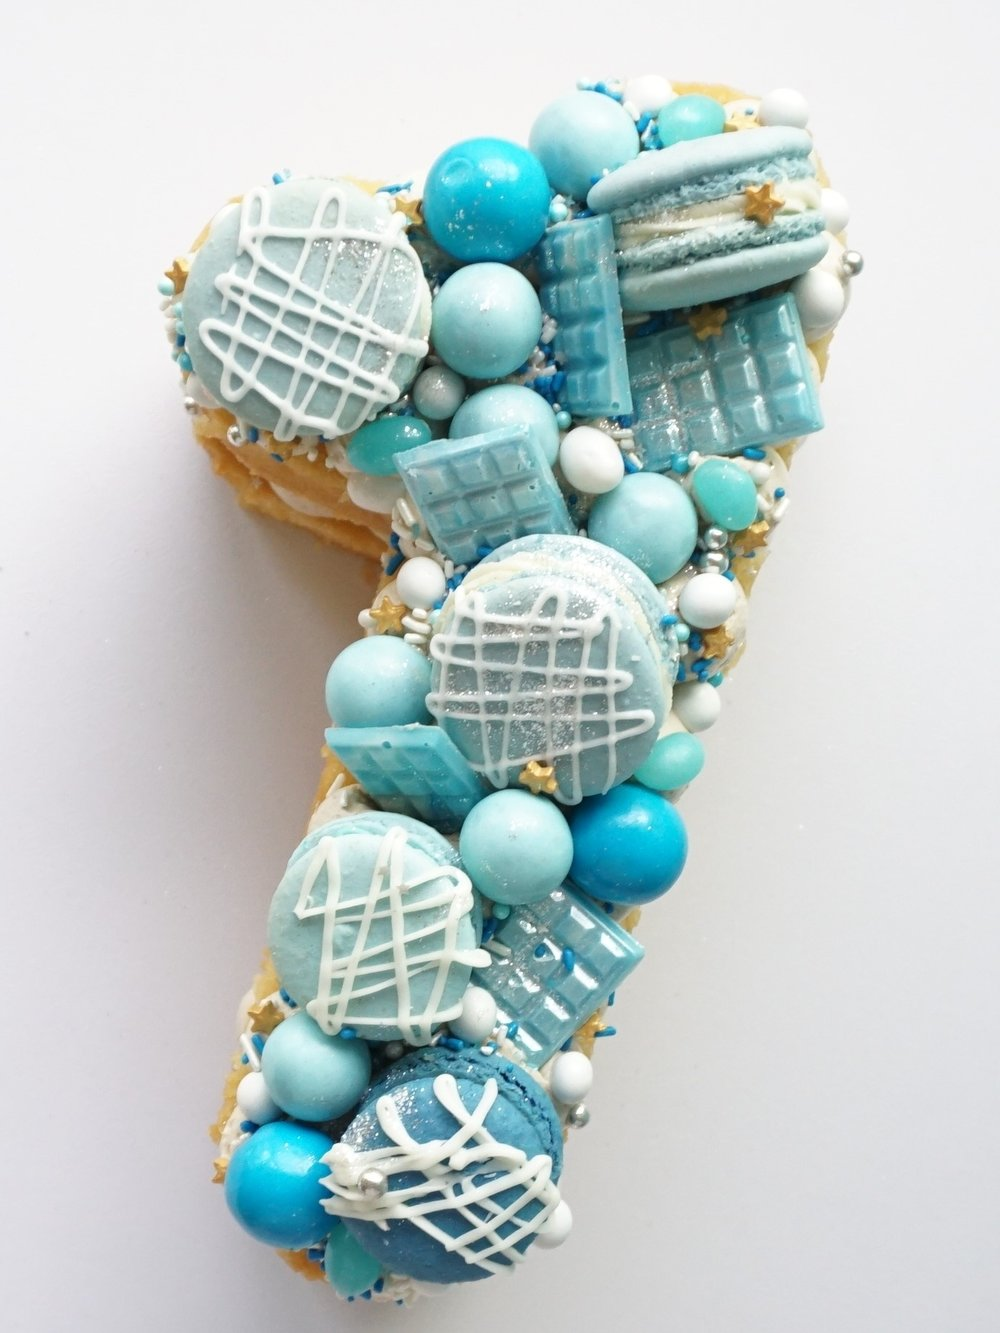 Cakes_By_Aranee_Perth_Drip_Cakes_Custom_Cakes_Wedding_Cakes_Macarons_Cupcakes_Personalised_Cookies_CAKES_Gallery7 (2).jpg